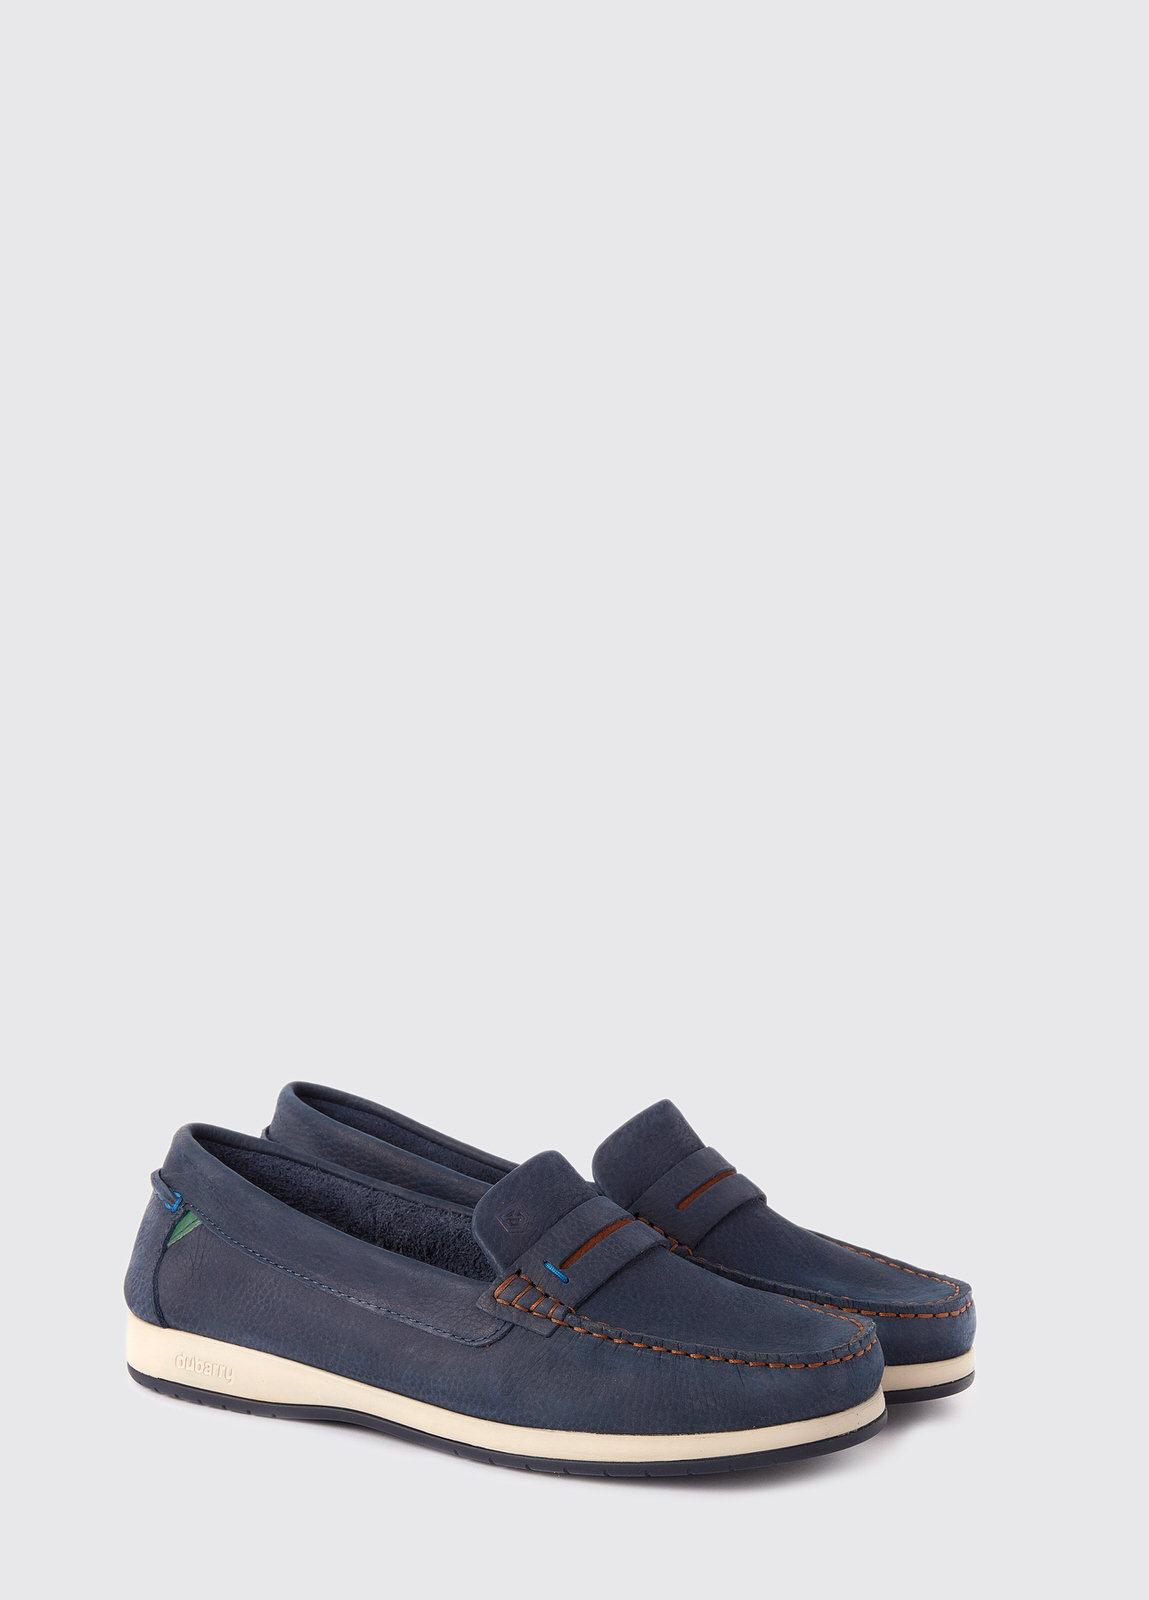 Mizen X LT Deck shoes - Navy